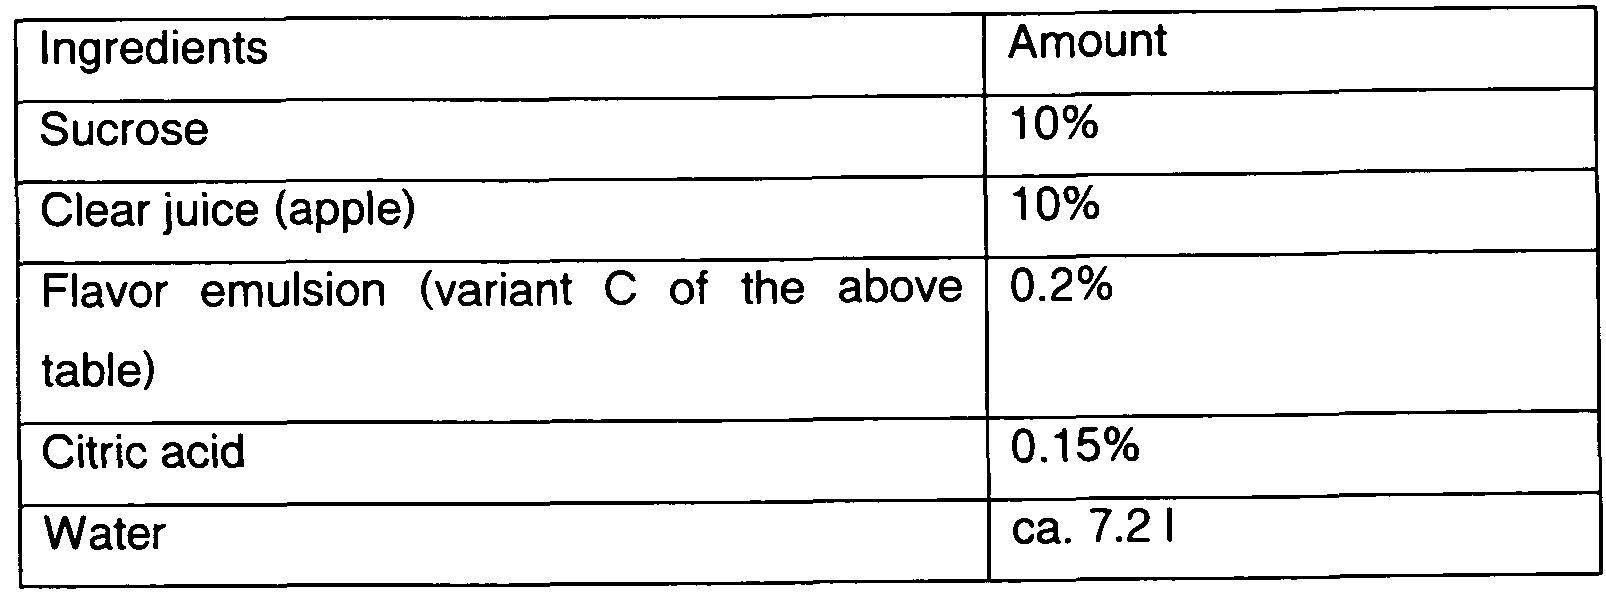 Wo2012167920a1 Long Chain Glycolipids Useful To Avoid Perishing Or Curcuma Rmulsion Blackcurrant Flavour Figure Imgf000160 0001